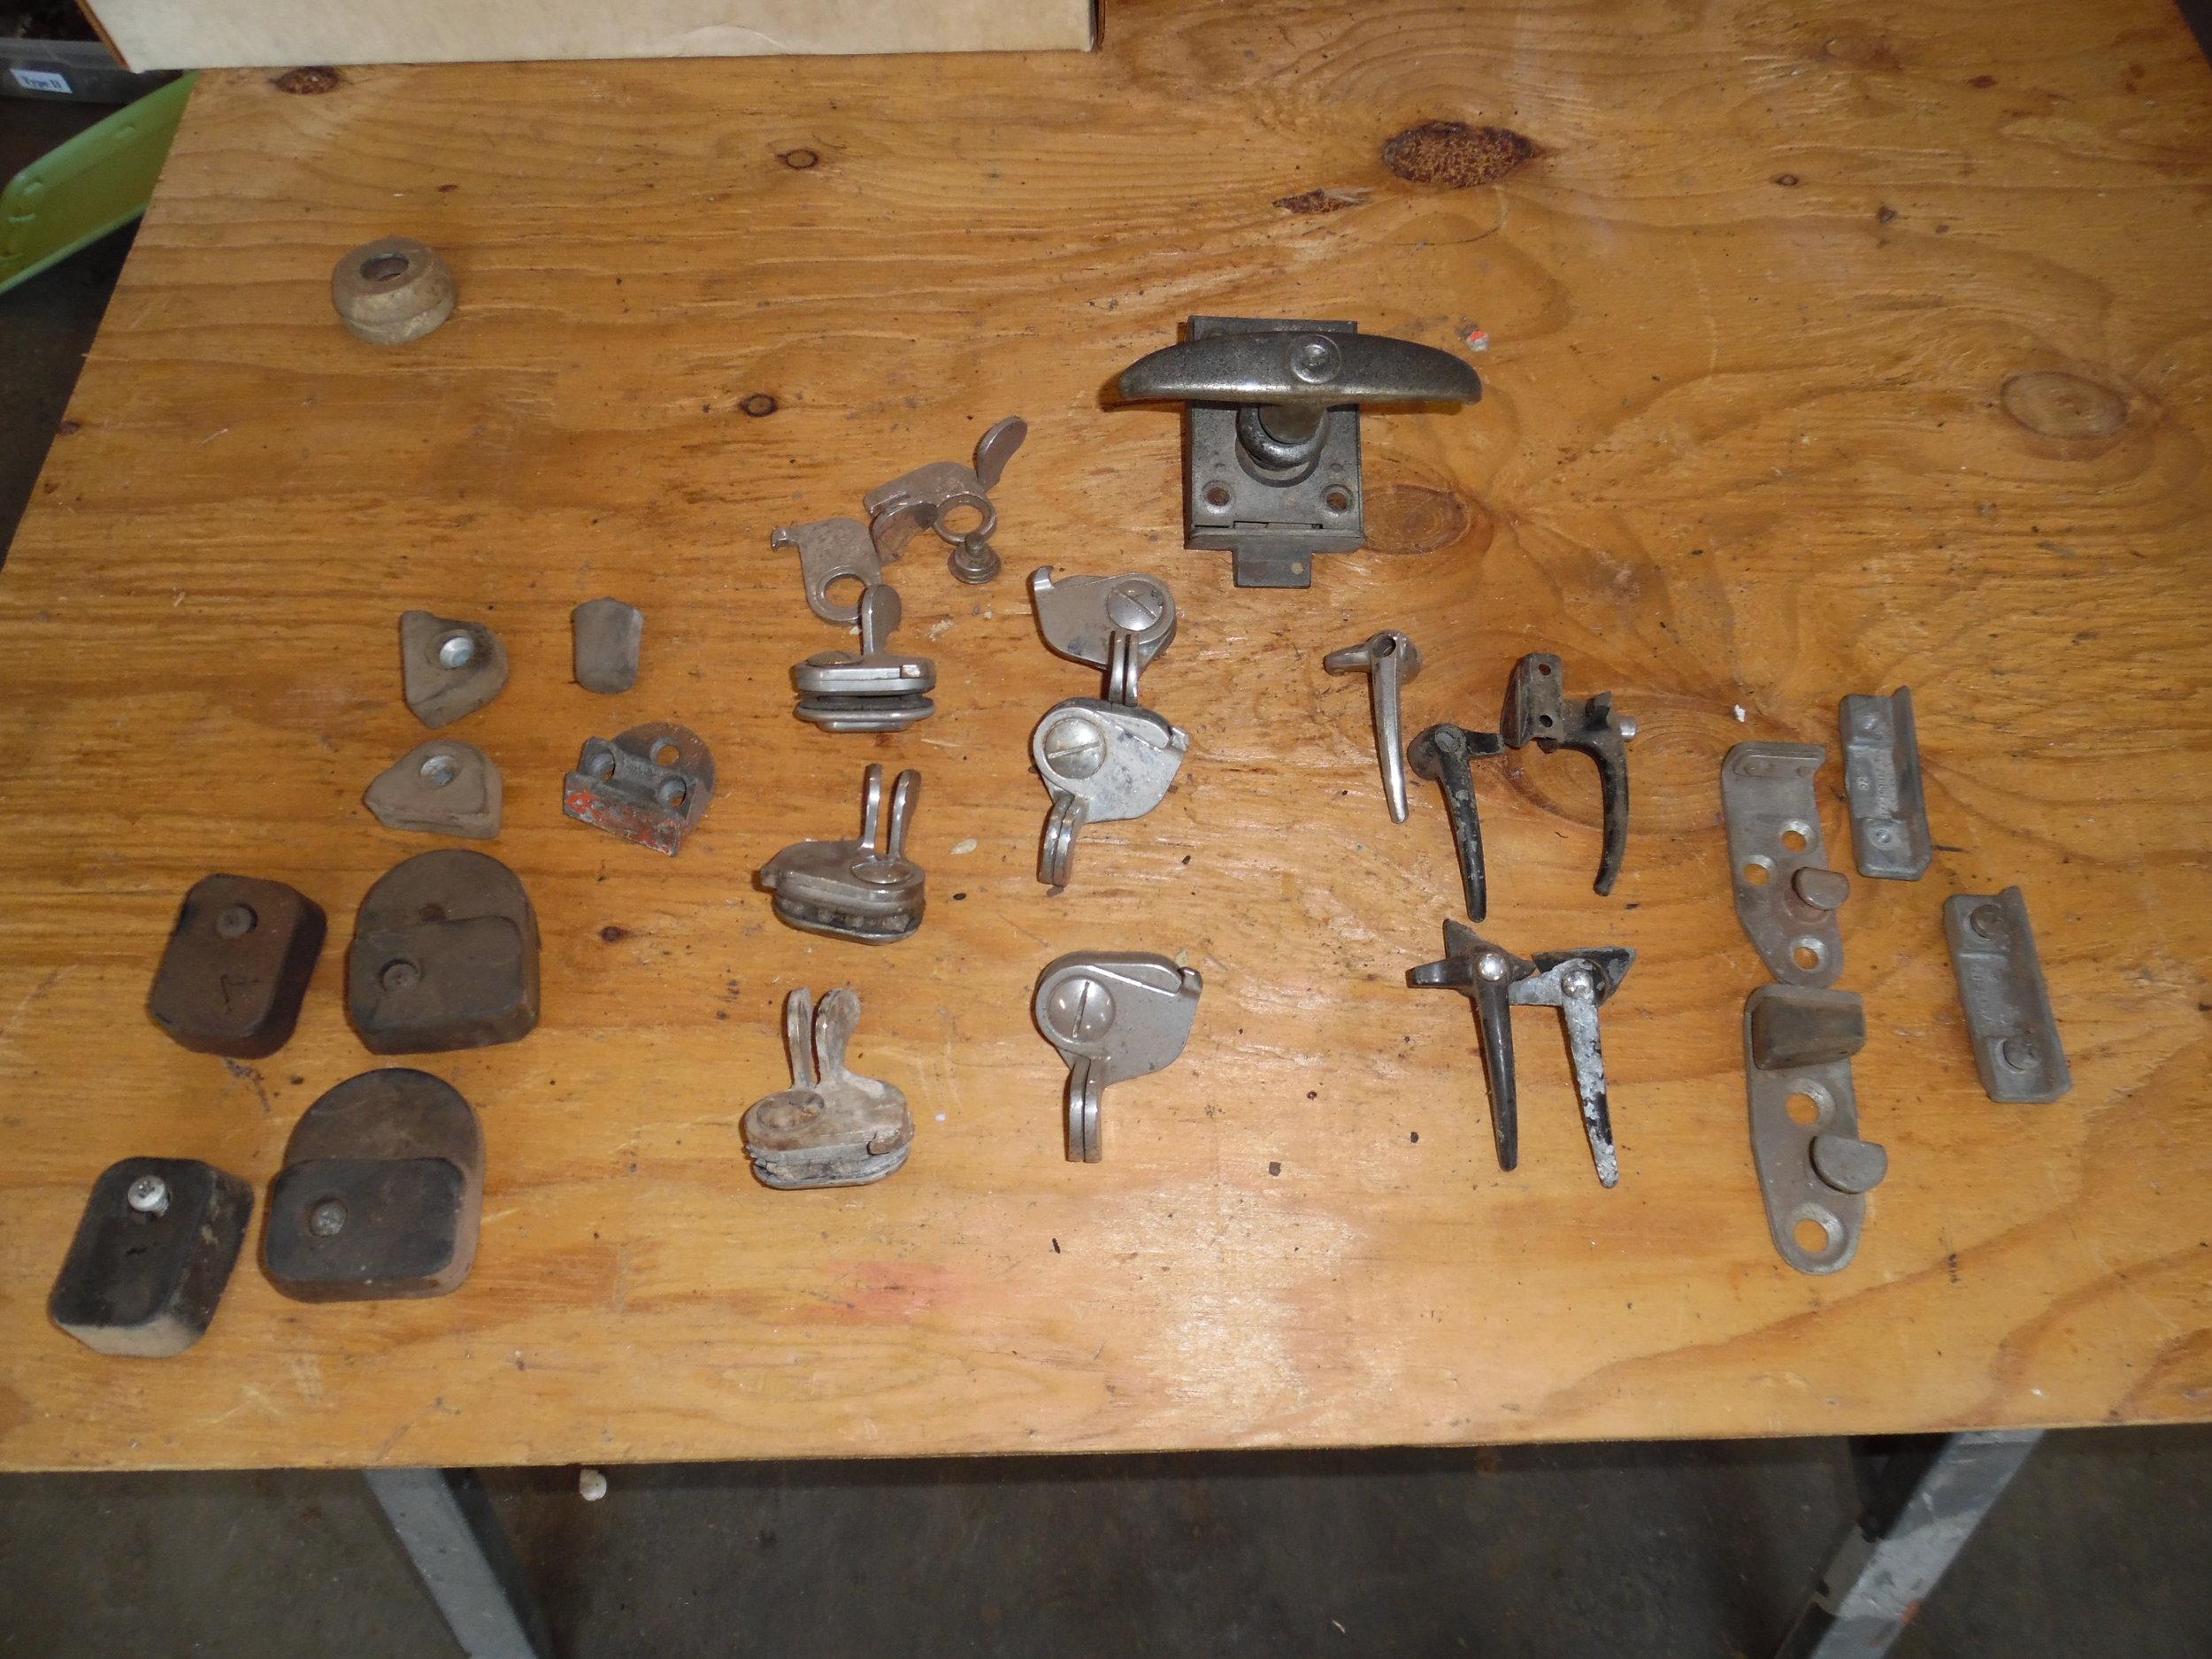 split bus parts 011.JPG